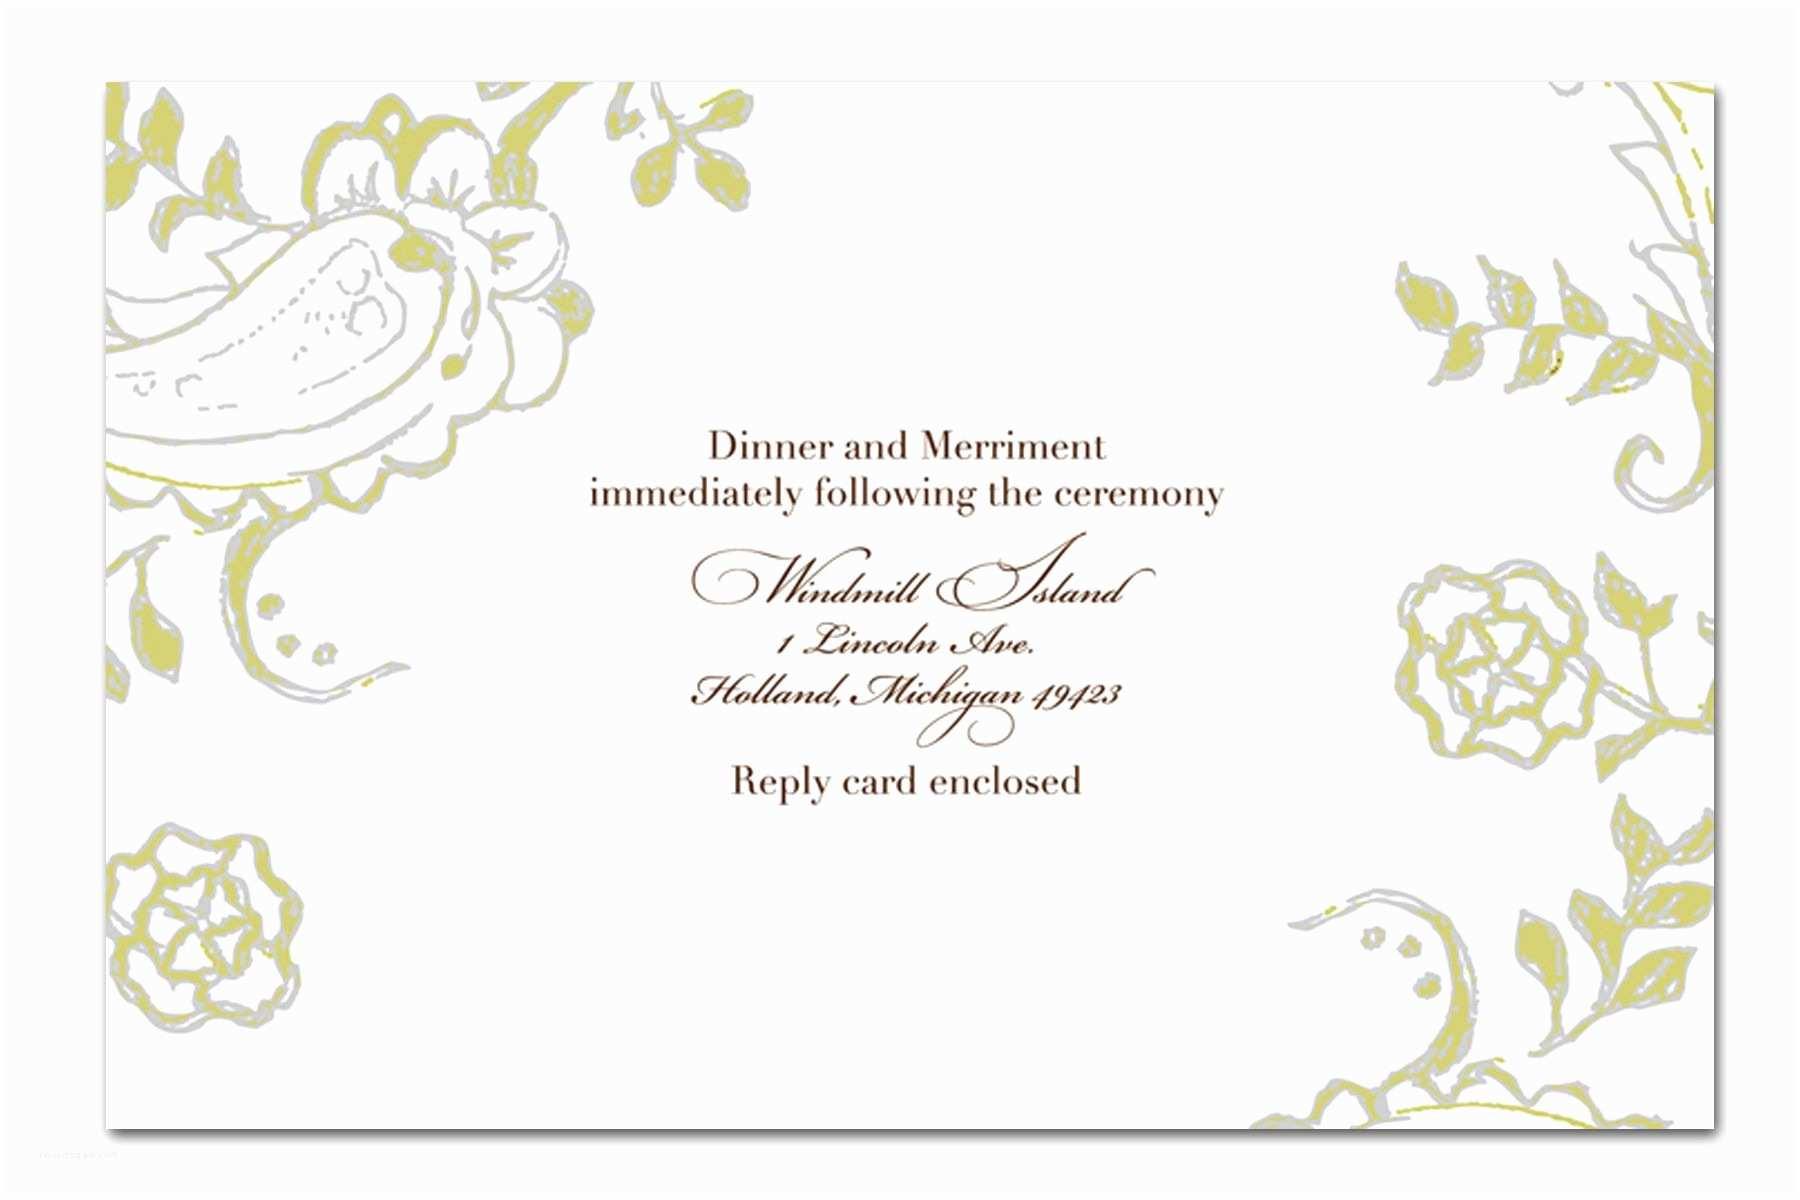 Wedding Invitation with Photo Templates Best Wedding Invitations Cards Wedding Invitation Card